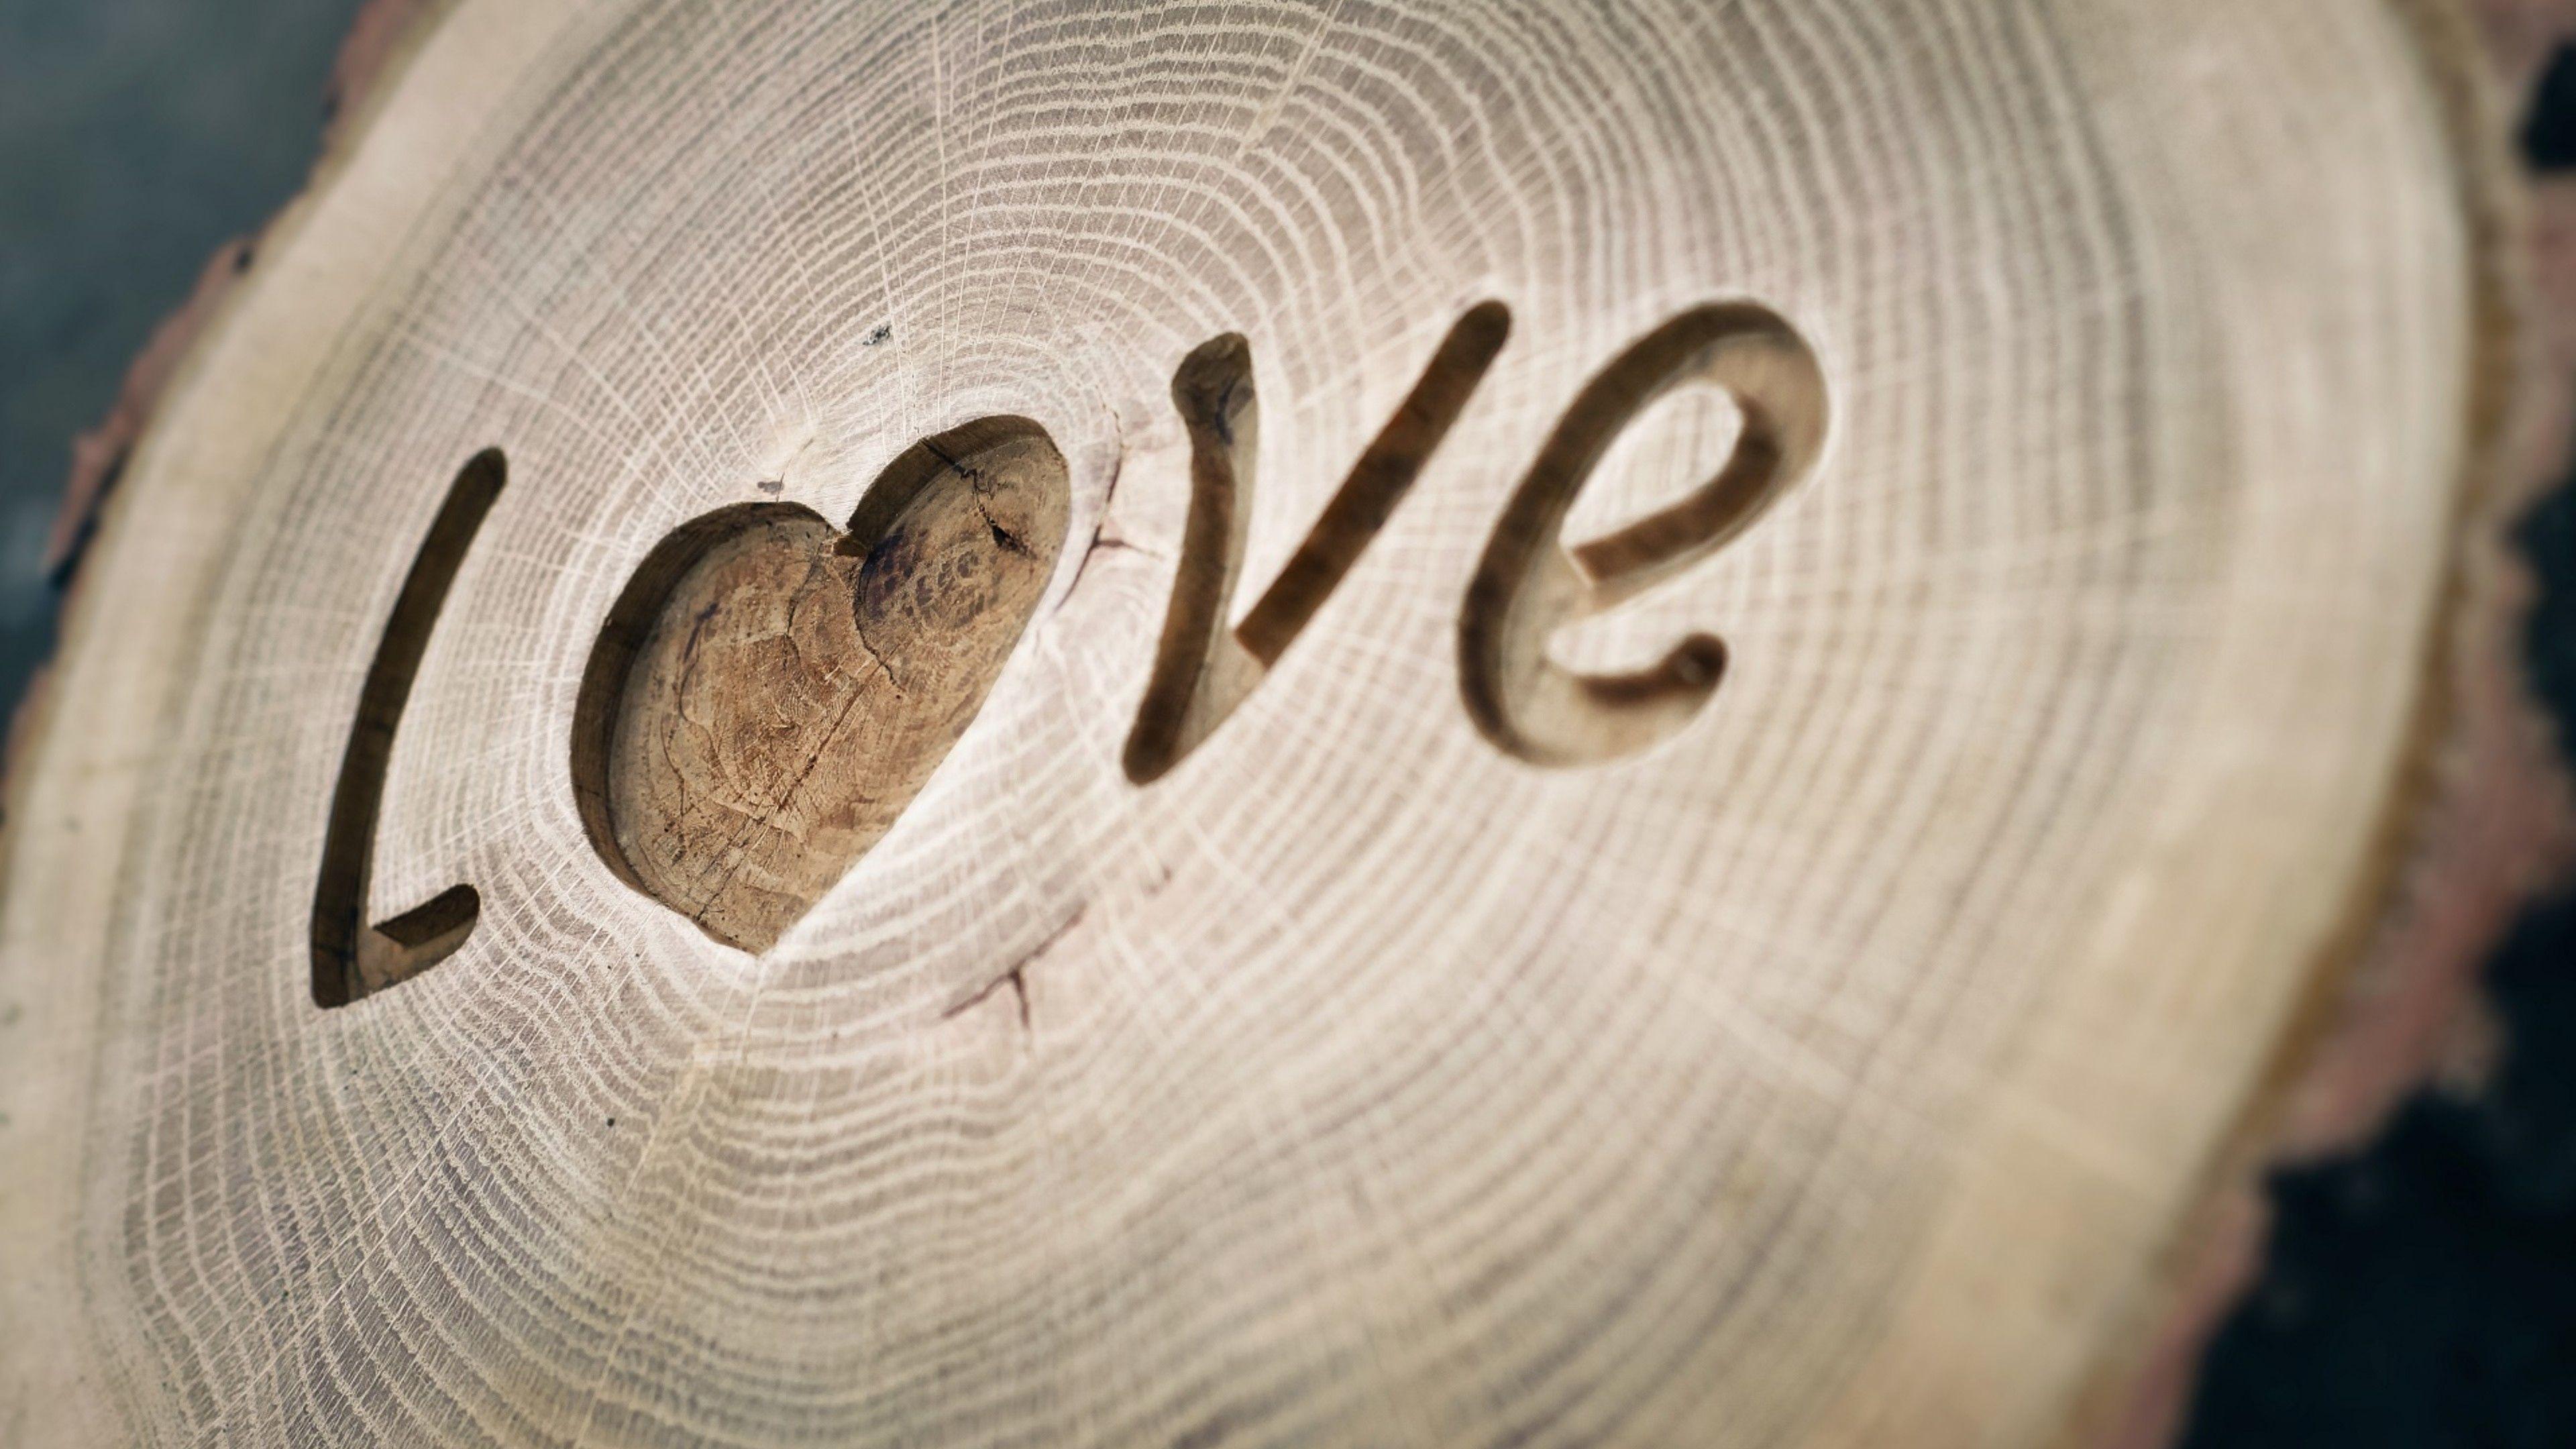 Wooden Love 4k Wallpaper 3840x2160 4kwallpaper Wallpaper Nature 4k Wallpaper 3840x2160 Love Wallpaper Wallpaper